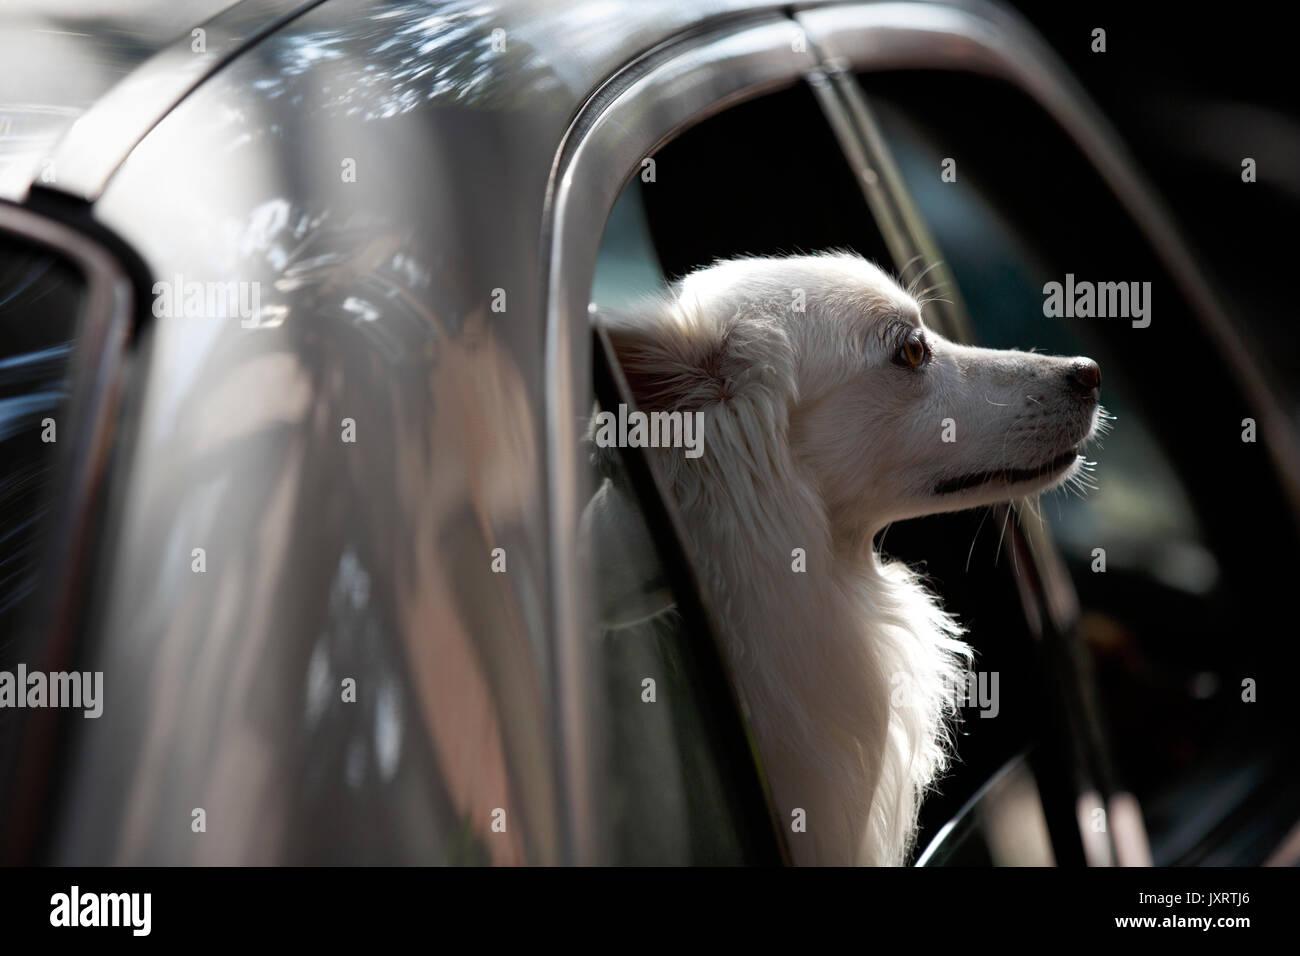 Dog looking out car window Boston Massachusetts Stock Photo